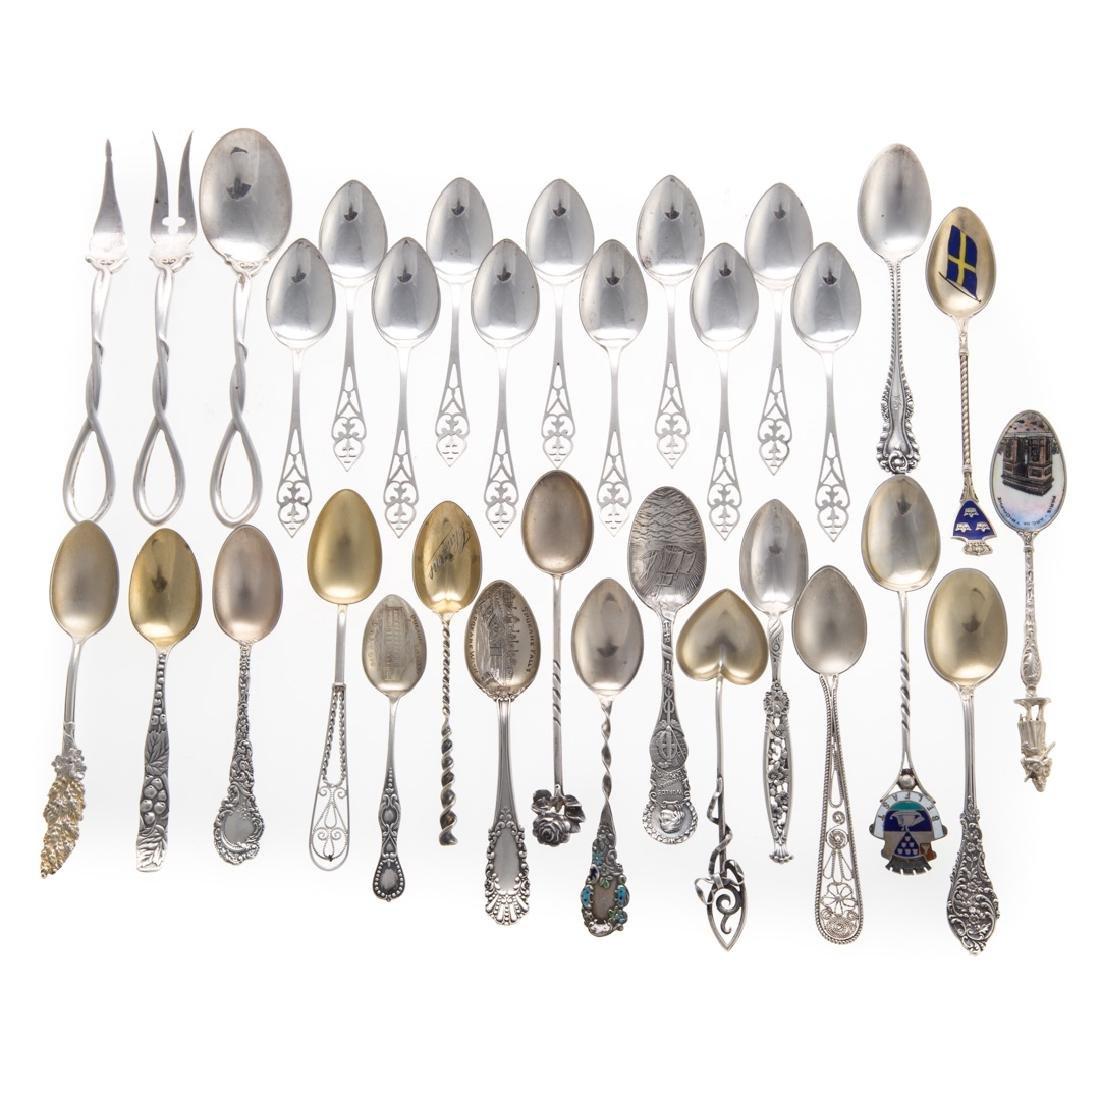 Assorted sterling souvenir & demitasse spoons